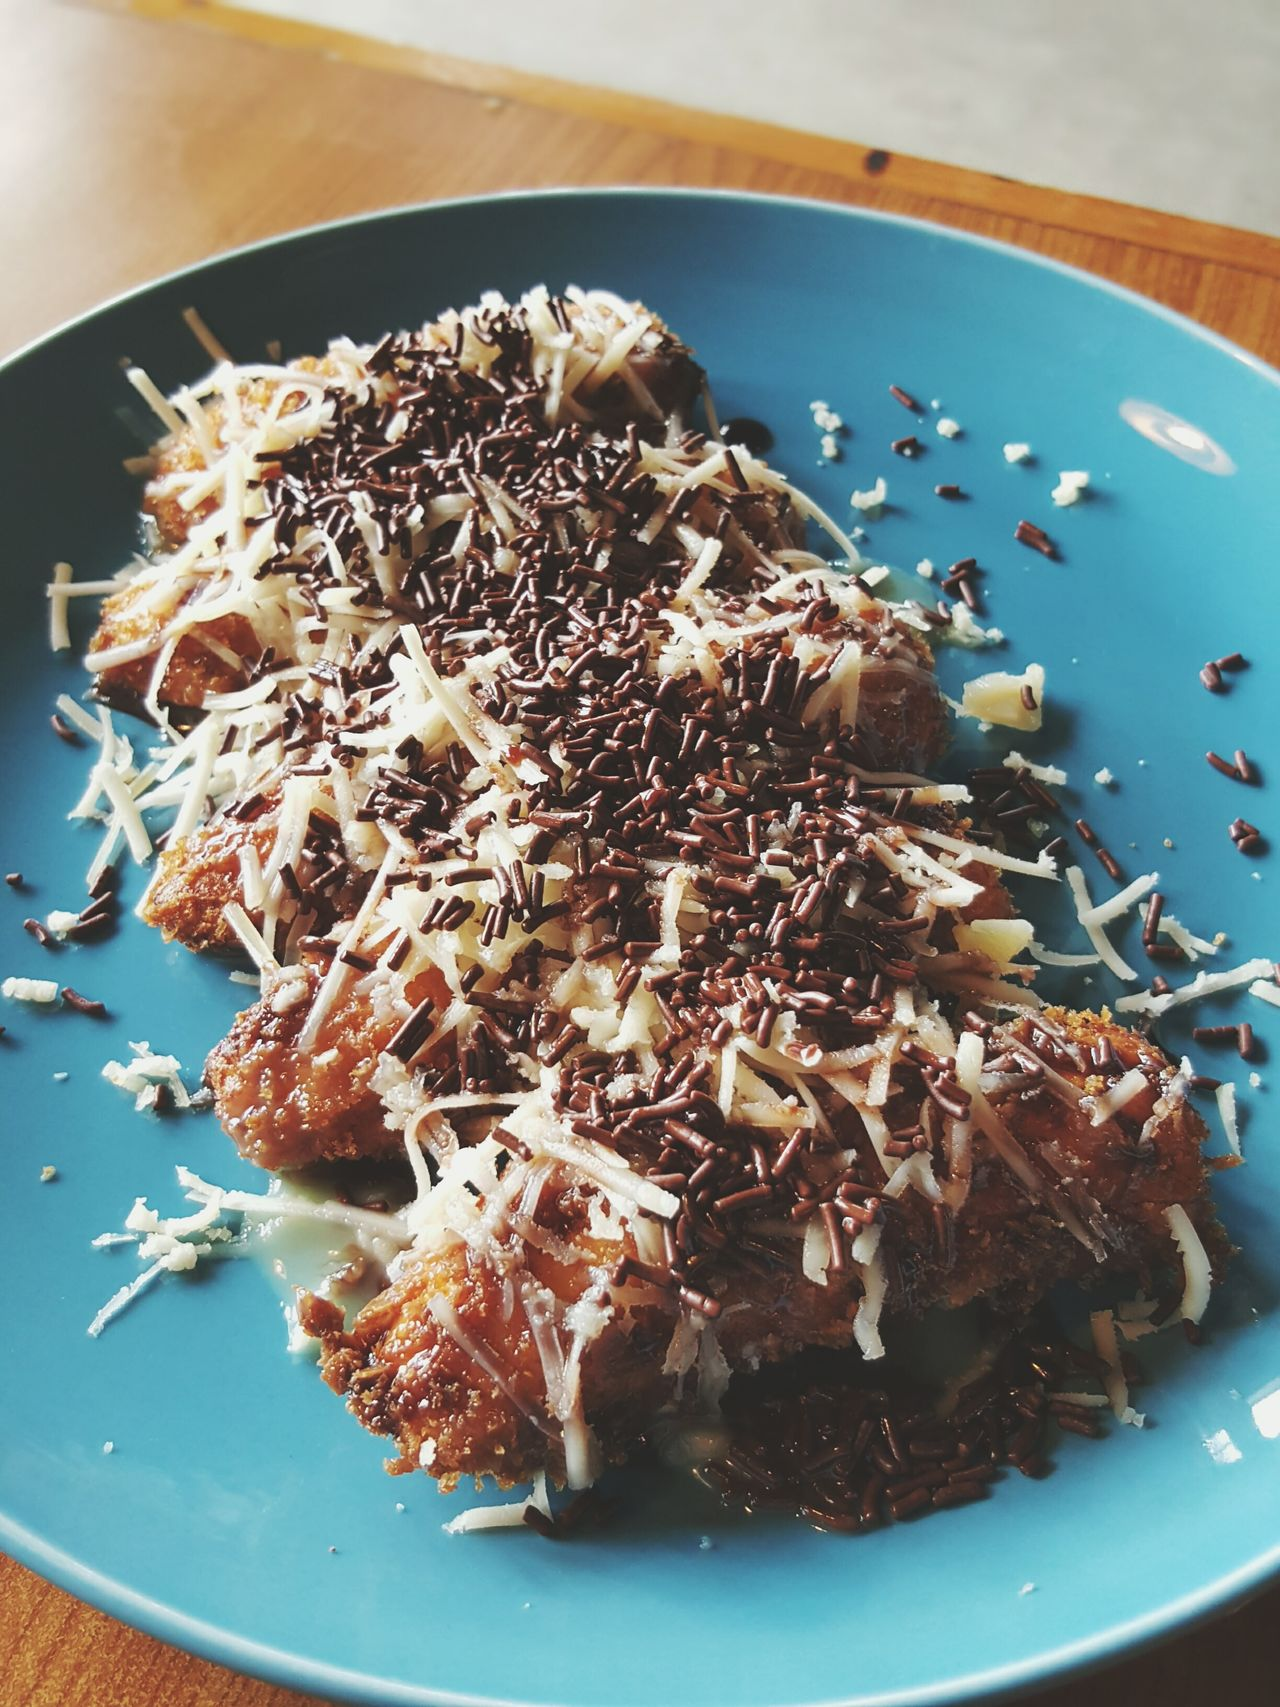 Banana Fried Food Foodporn Foodism Kuliner Kulinerindonesia Kulinerbandung Kulinerpalembang Love